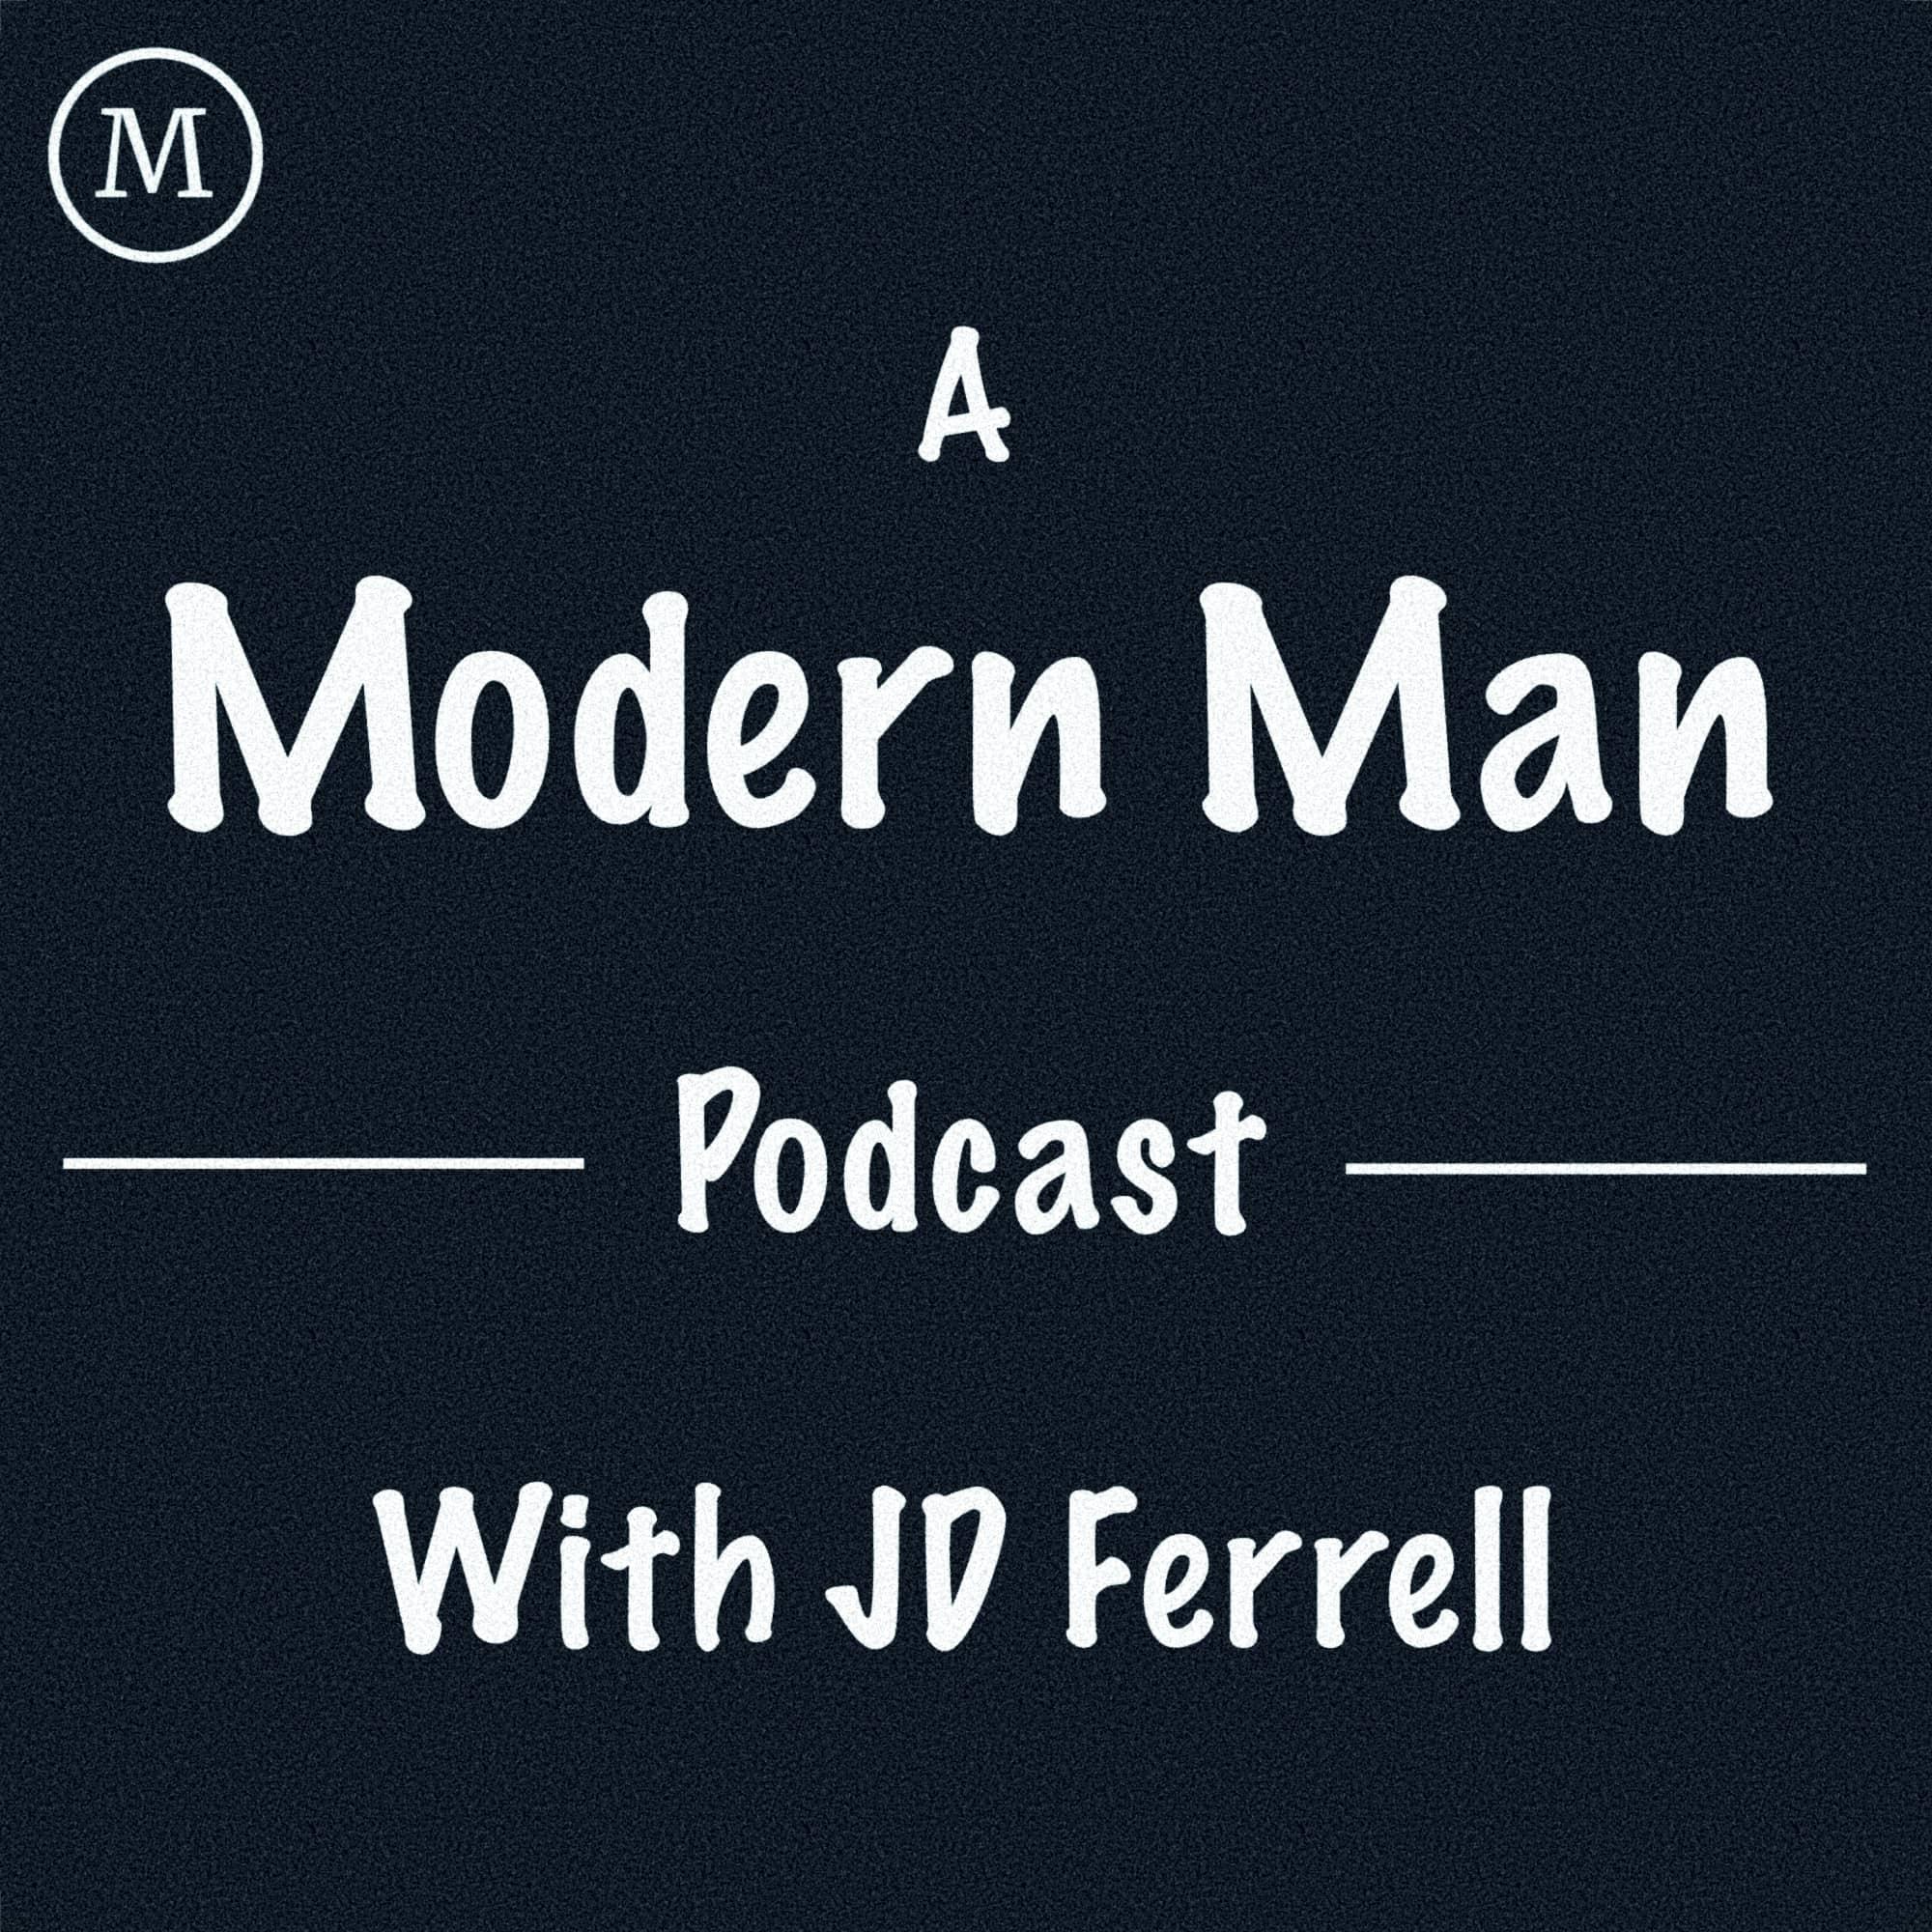 Artwork for podcast A Modern Man